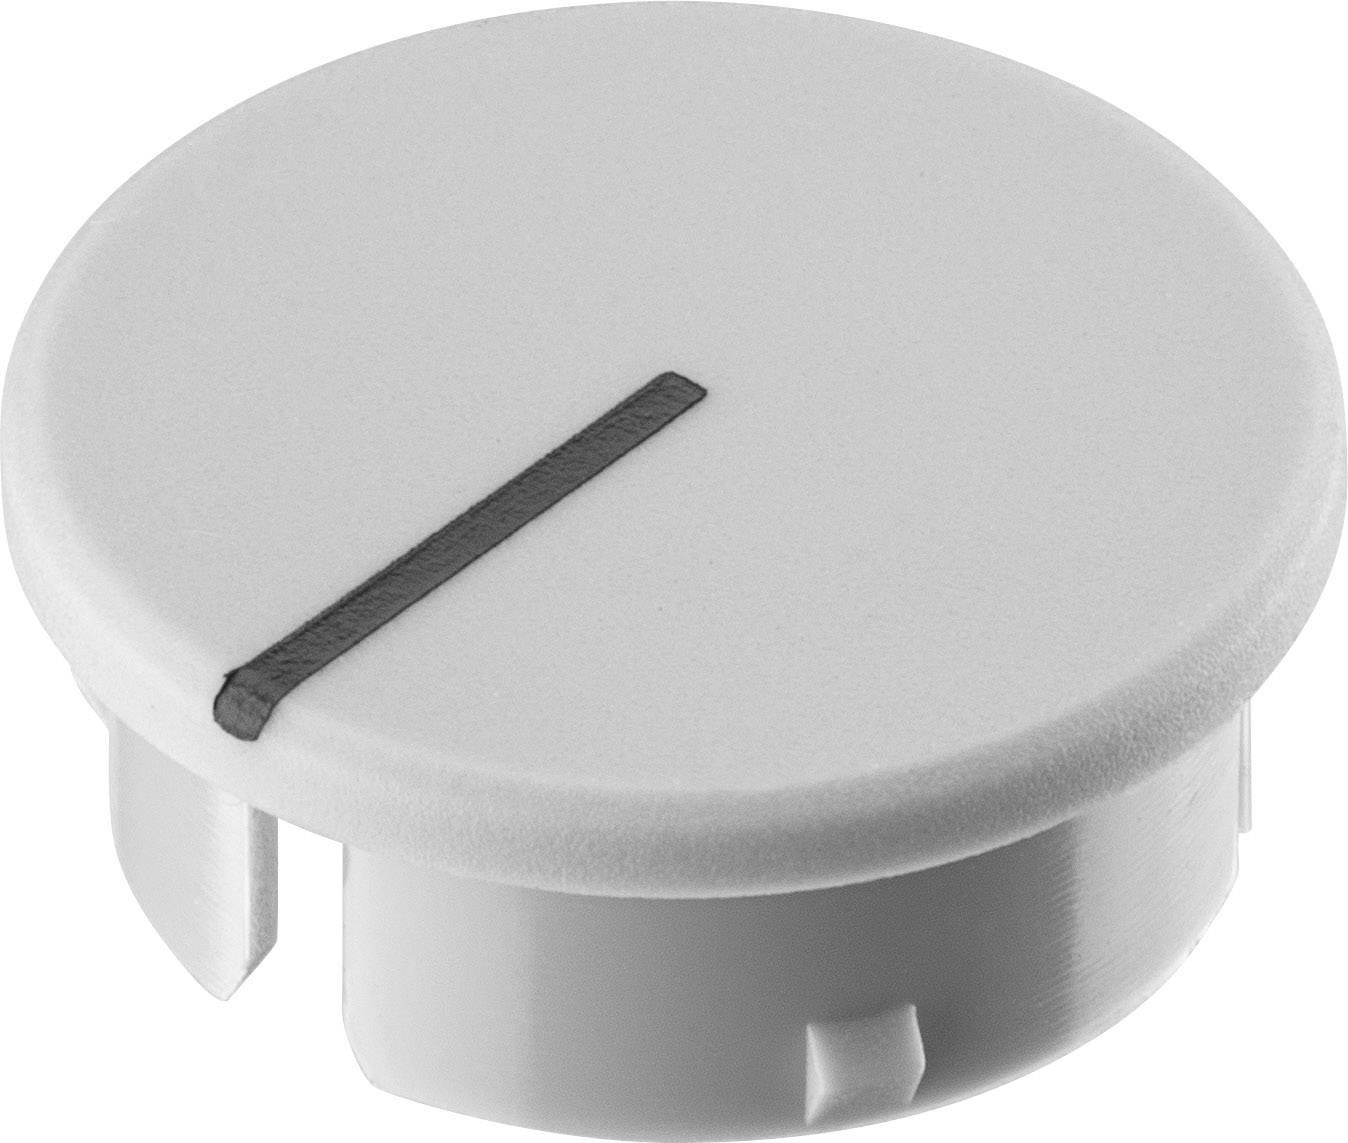 Krytka knoflíku s ukazatelem Ritel 30 21 11 1 15.4 mm, šedá, 1 ks